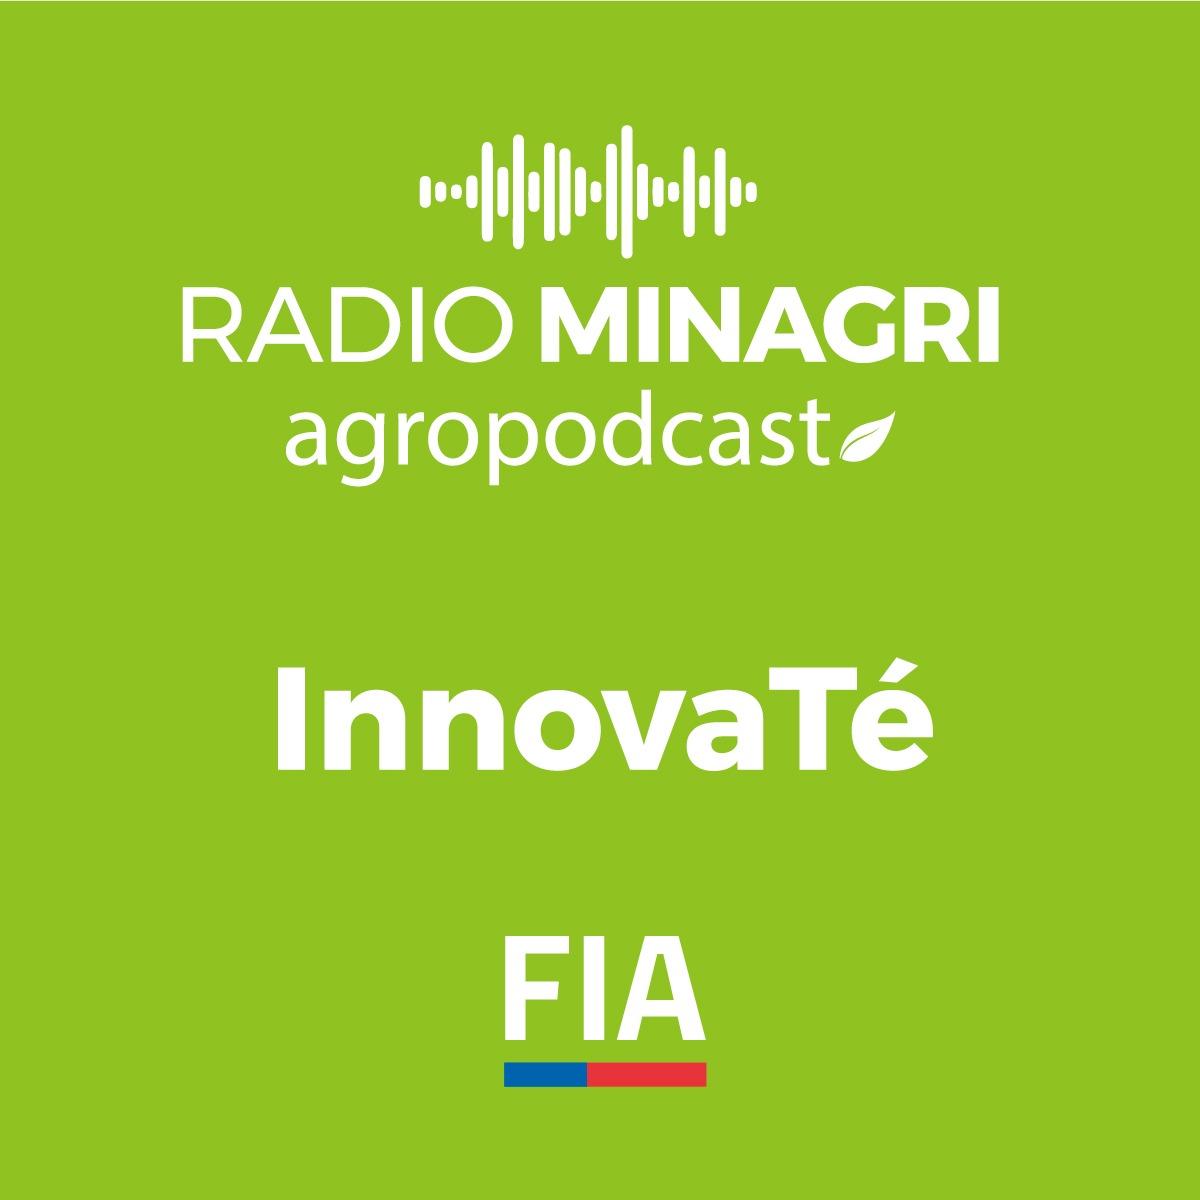 InnovaTé – Episodio 4: Primera plantación de wasabi en Chile